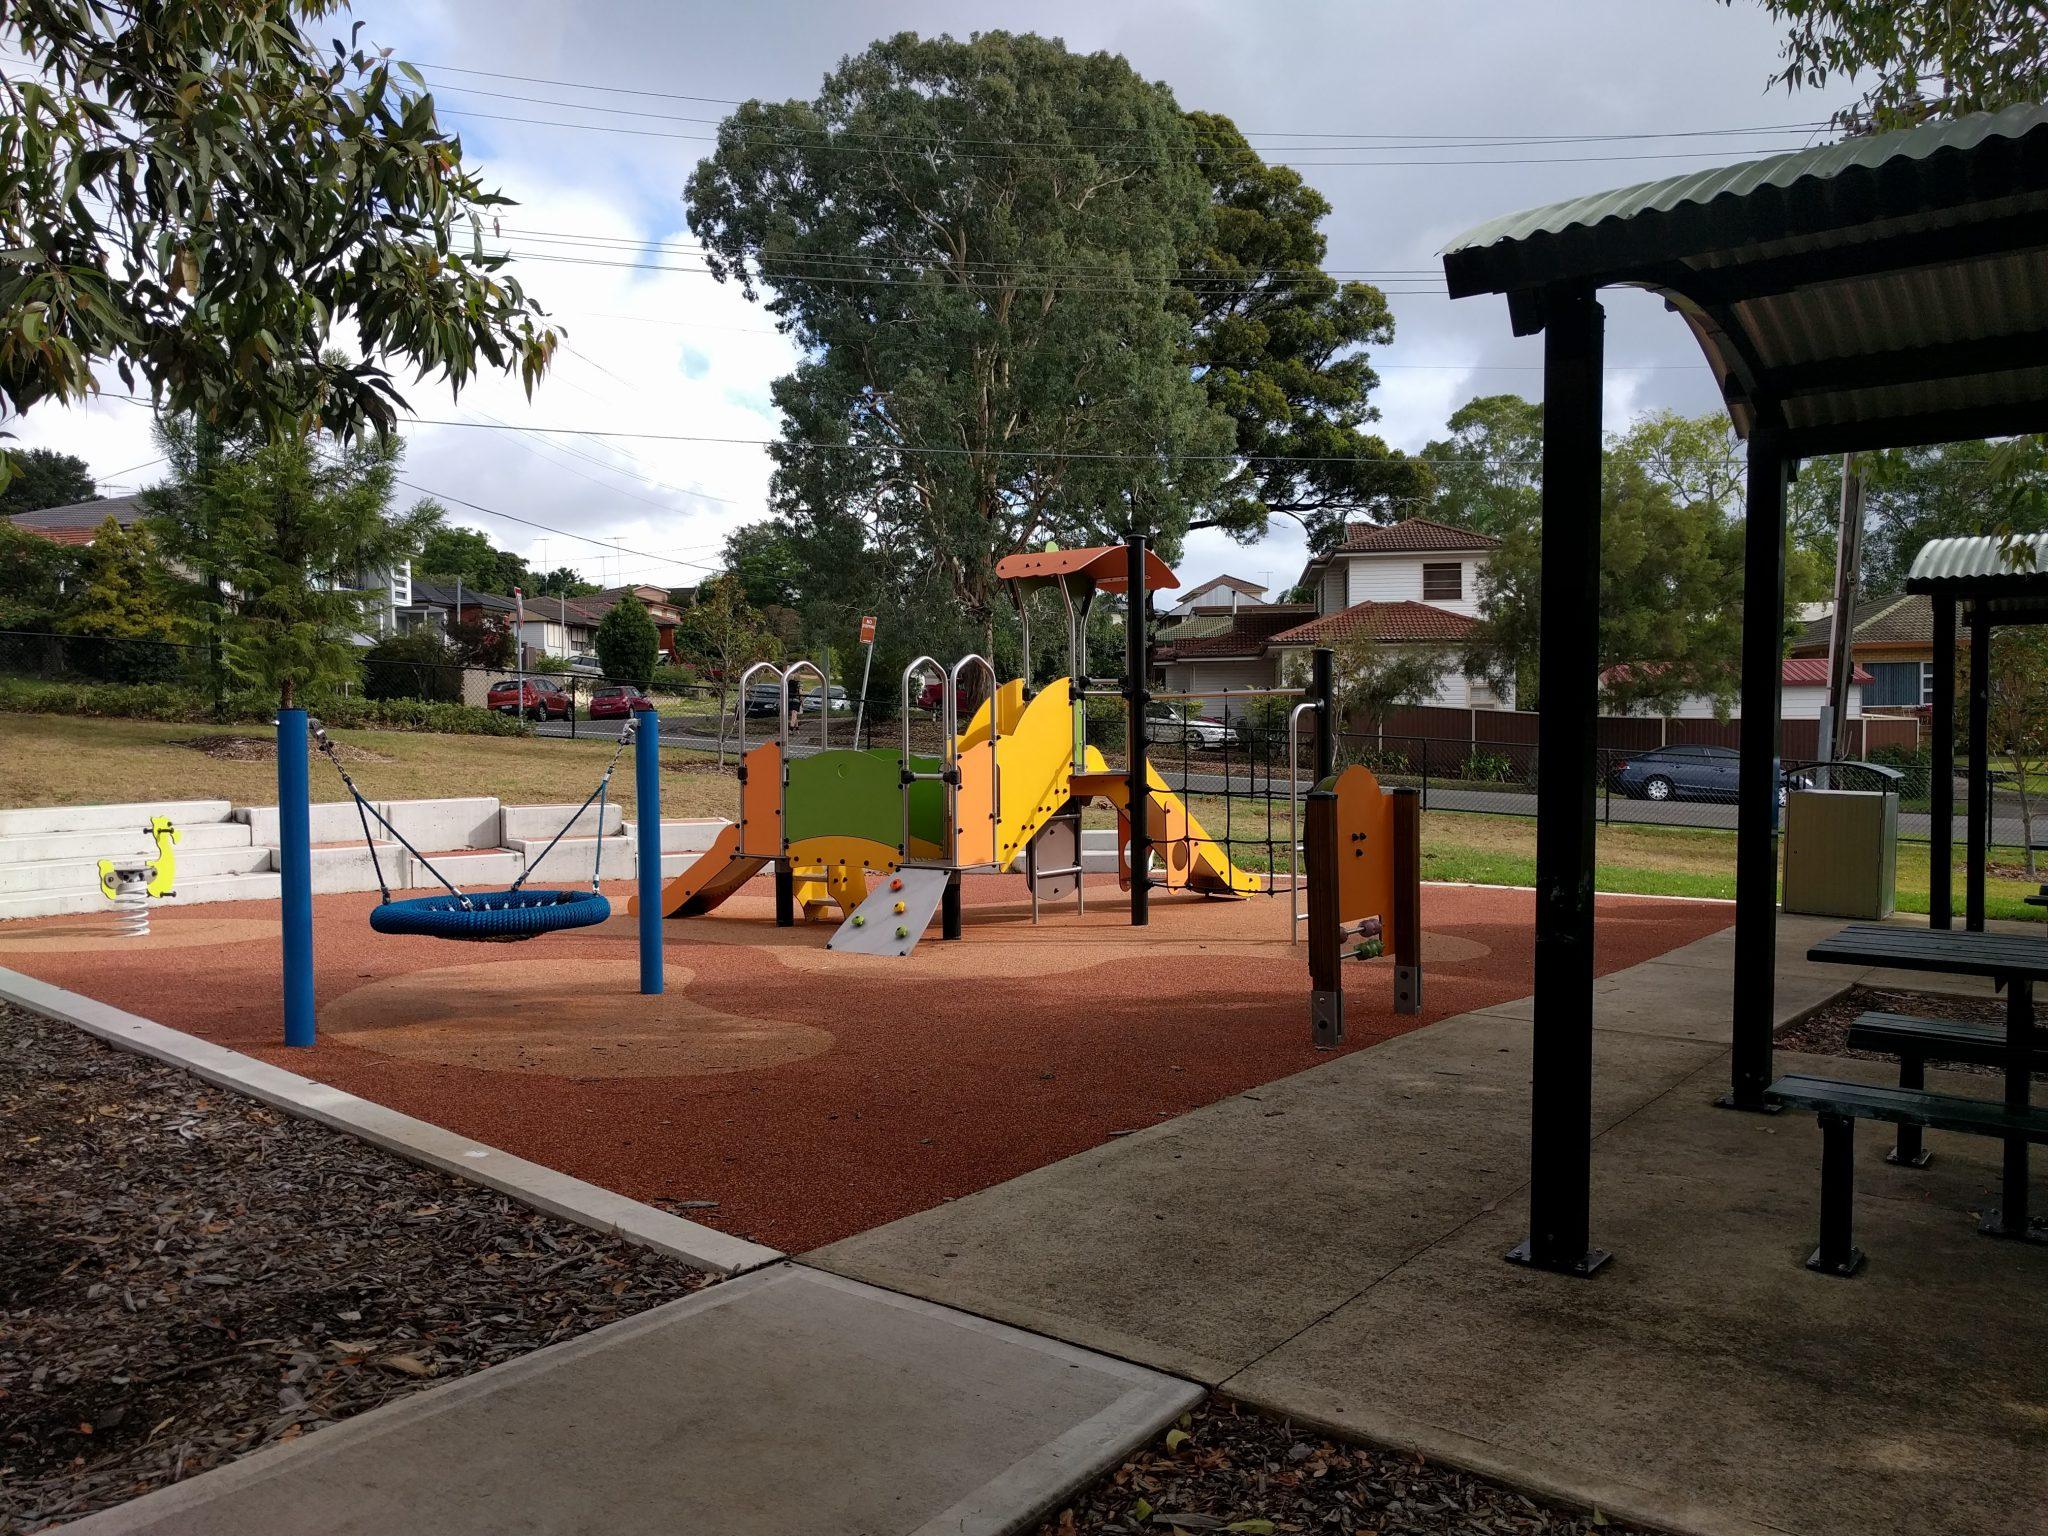 Greenleaf Park